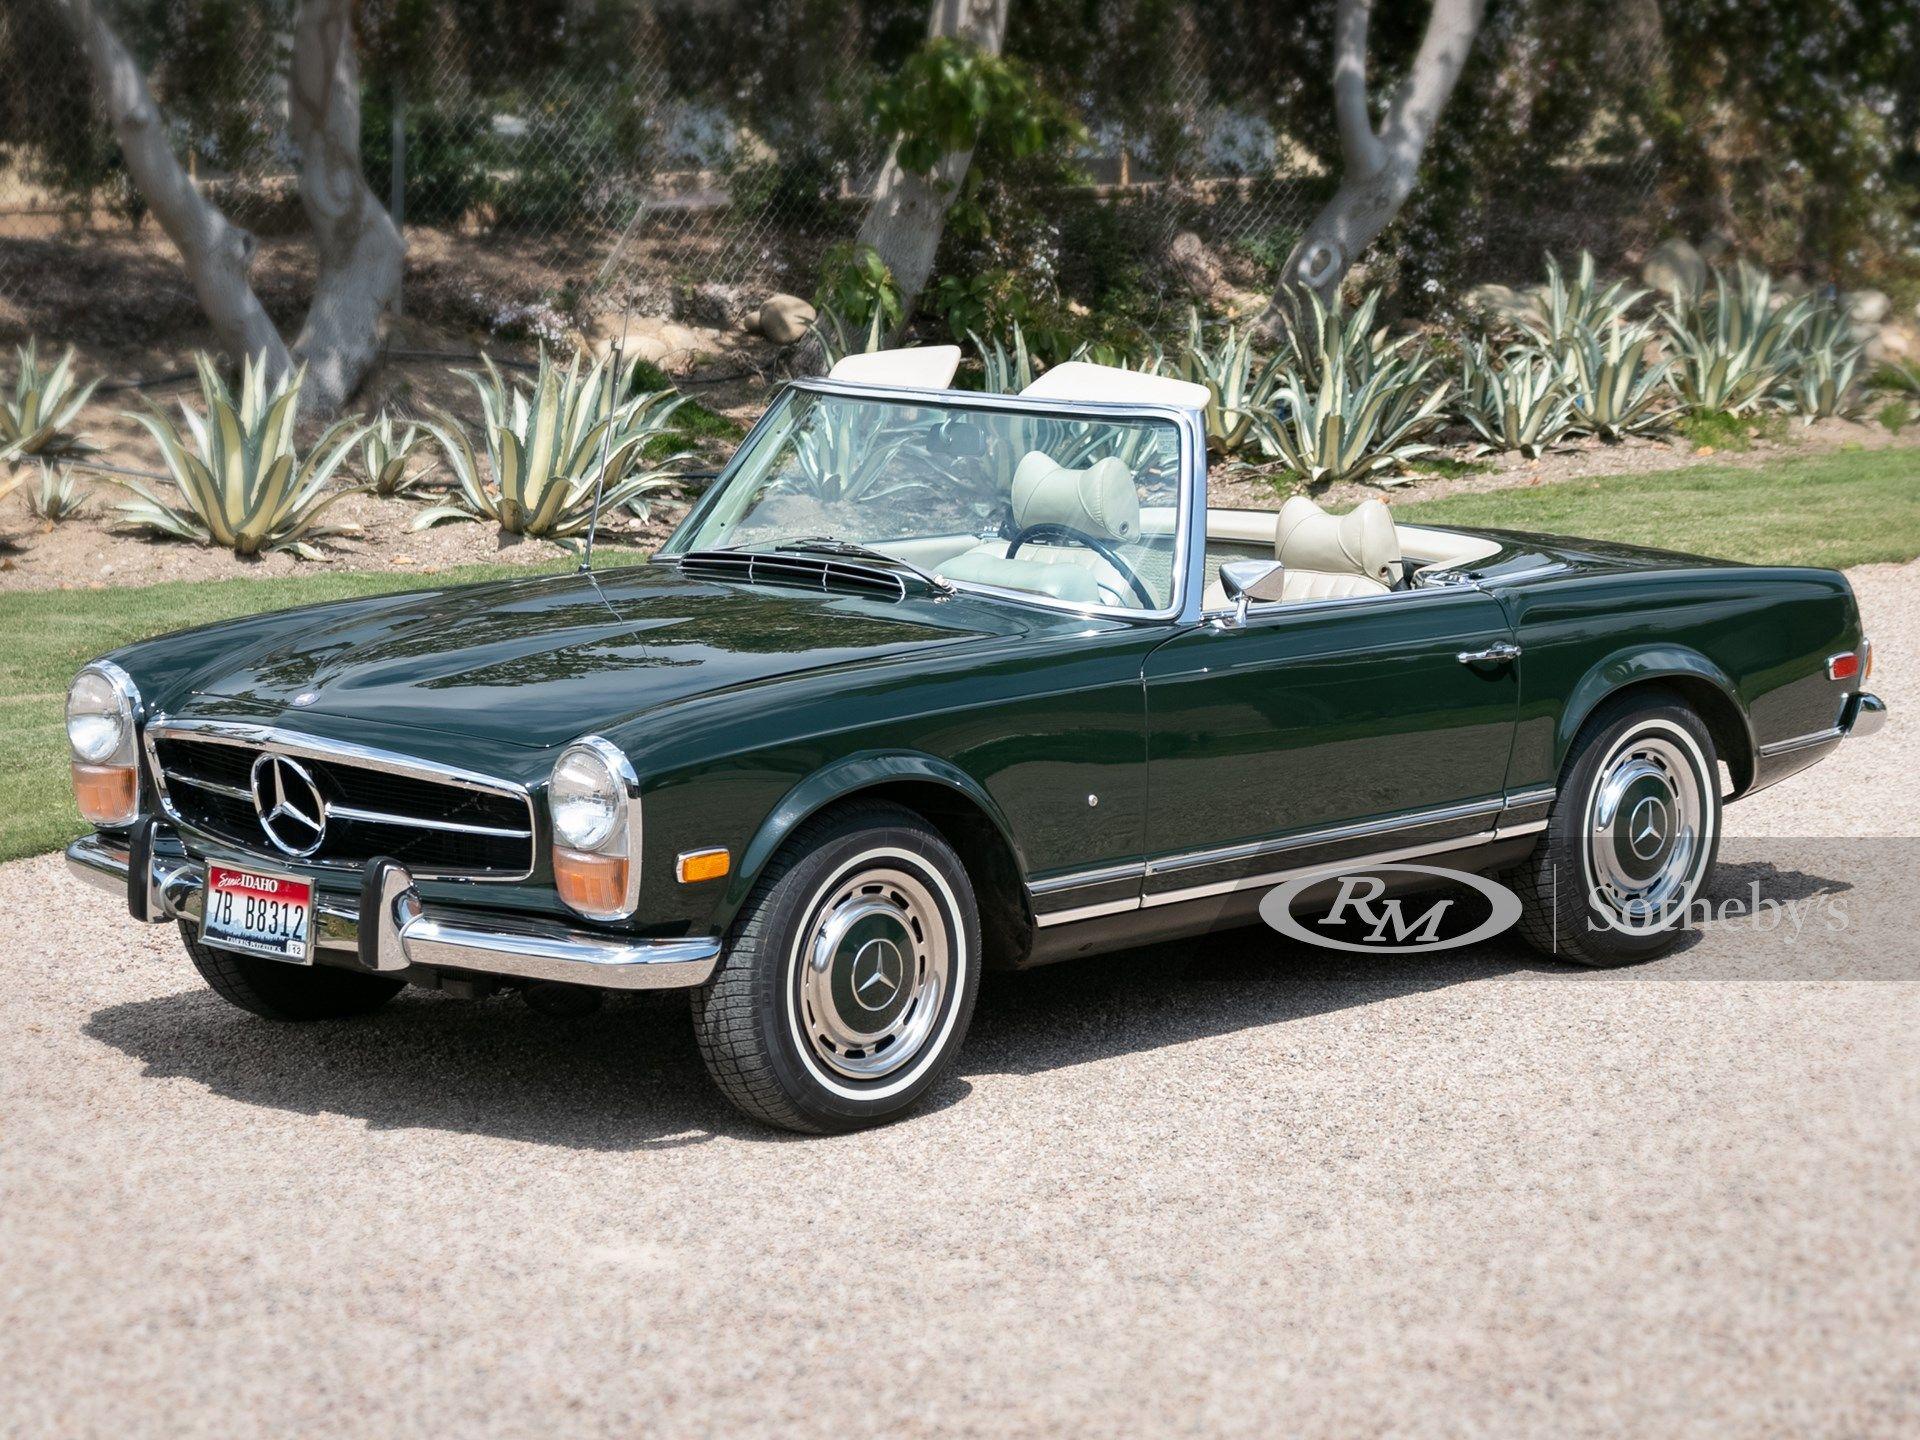 1971 Mercedes-Benz 280 SL 'Pagoda'